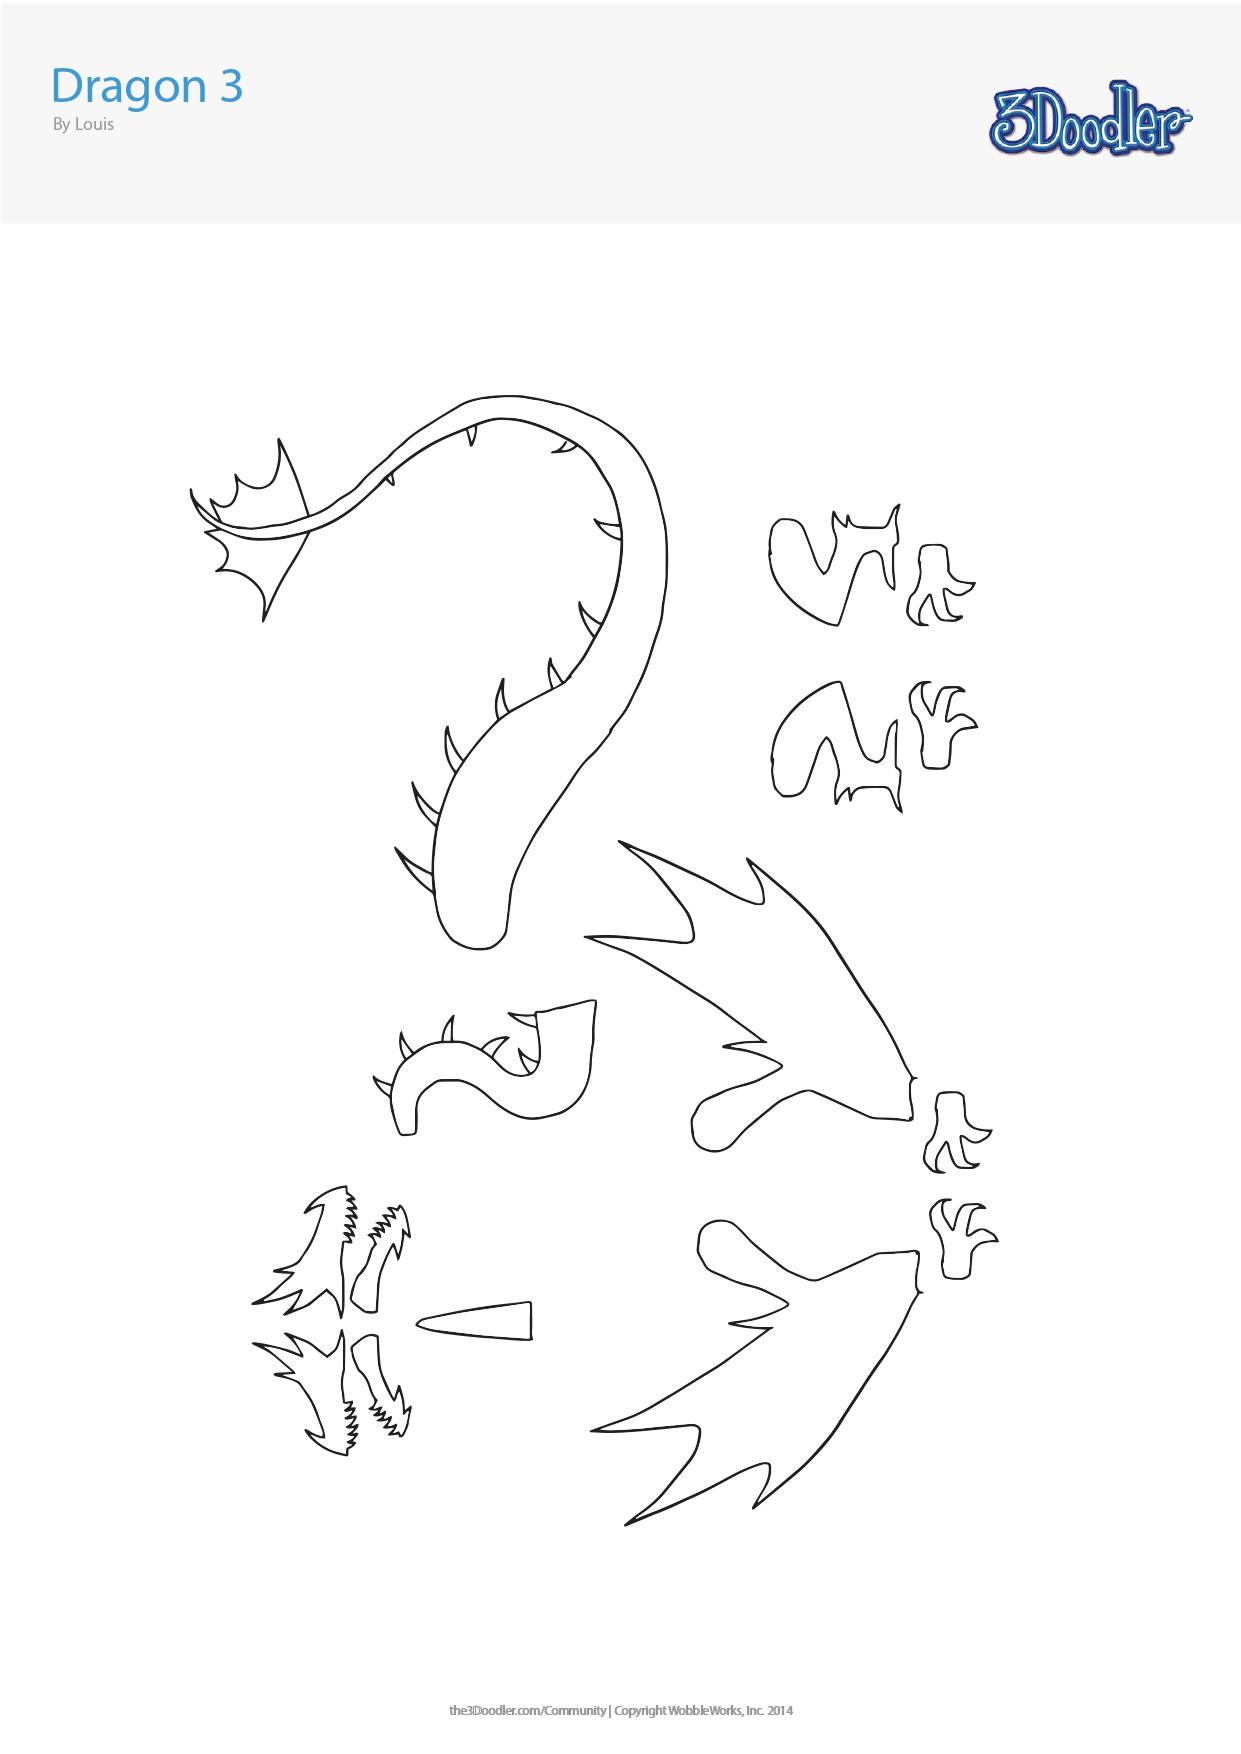 3D Pen Stencil Template Dragon 3